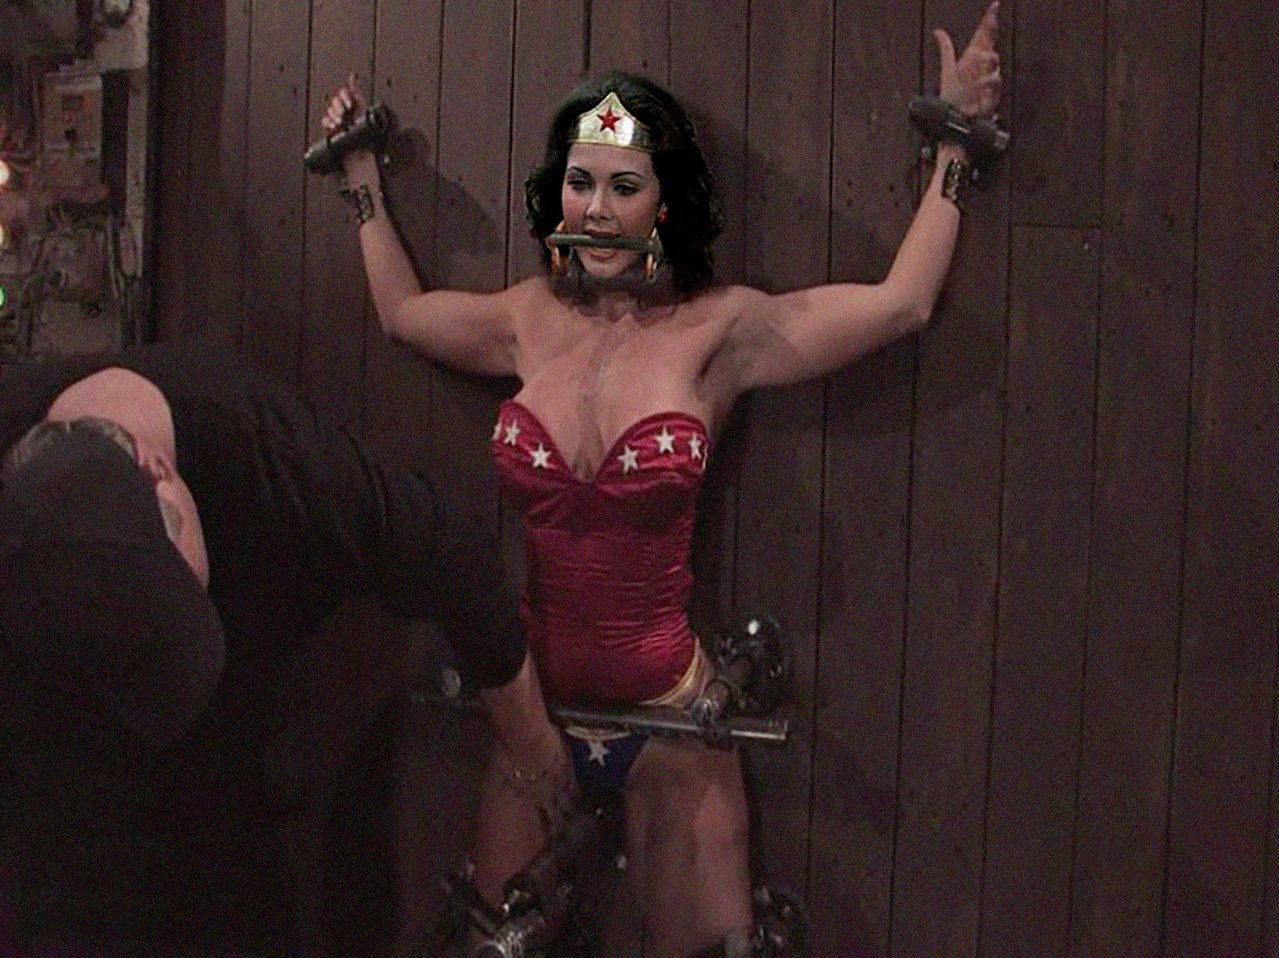 Wonder woman tied up nude